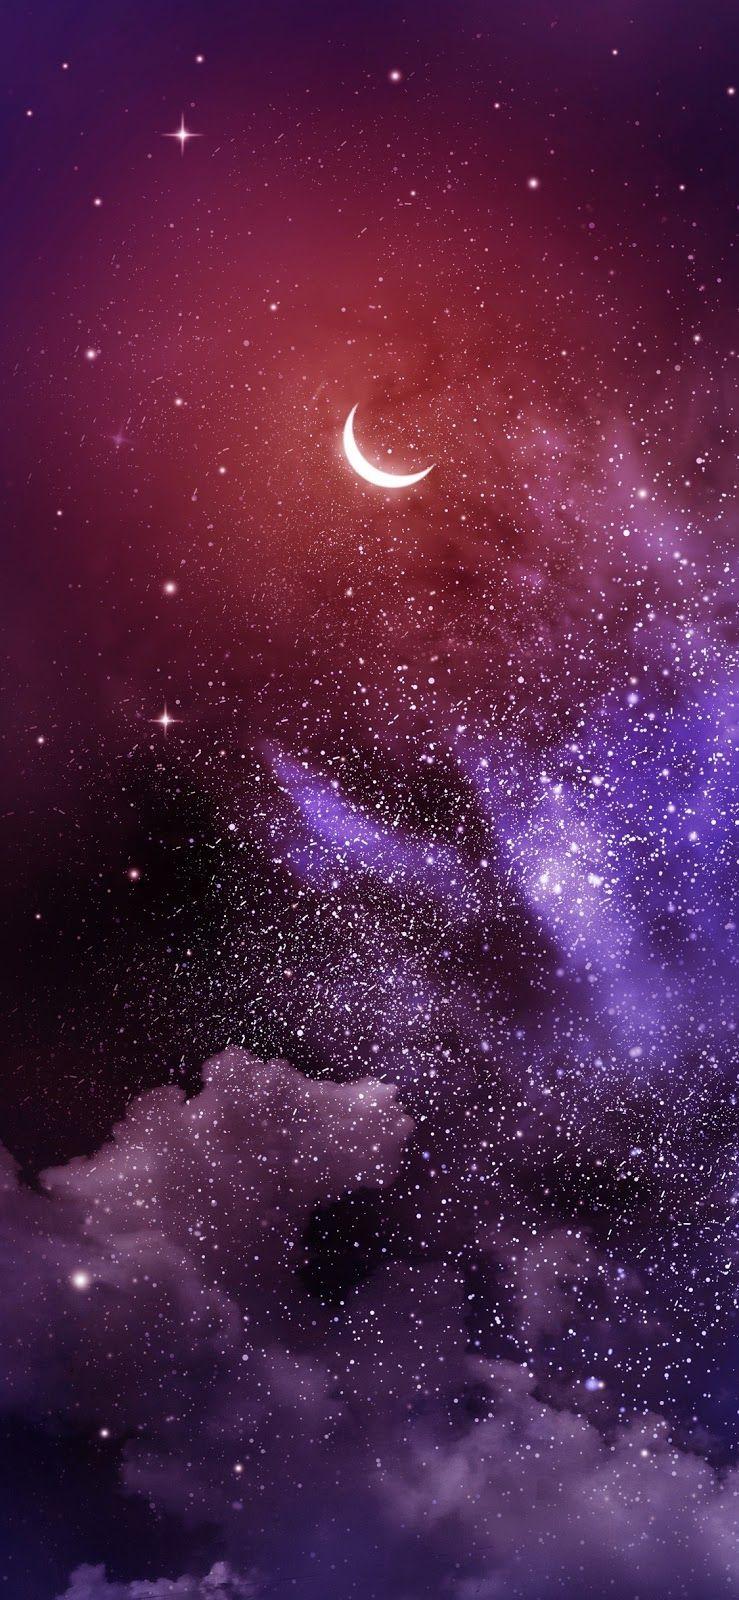 In The Night Iphone X 壁紙 スマホ壁紙 宇宙 壁紙